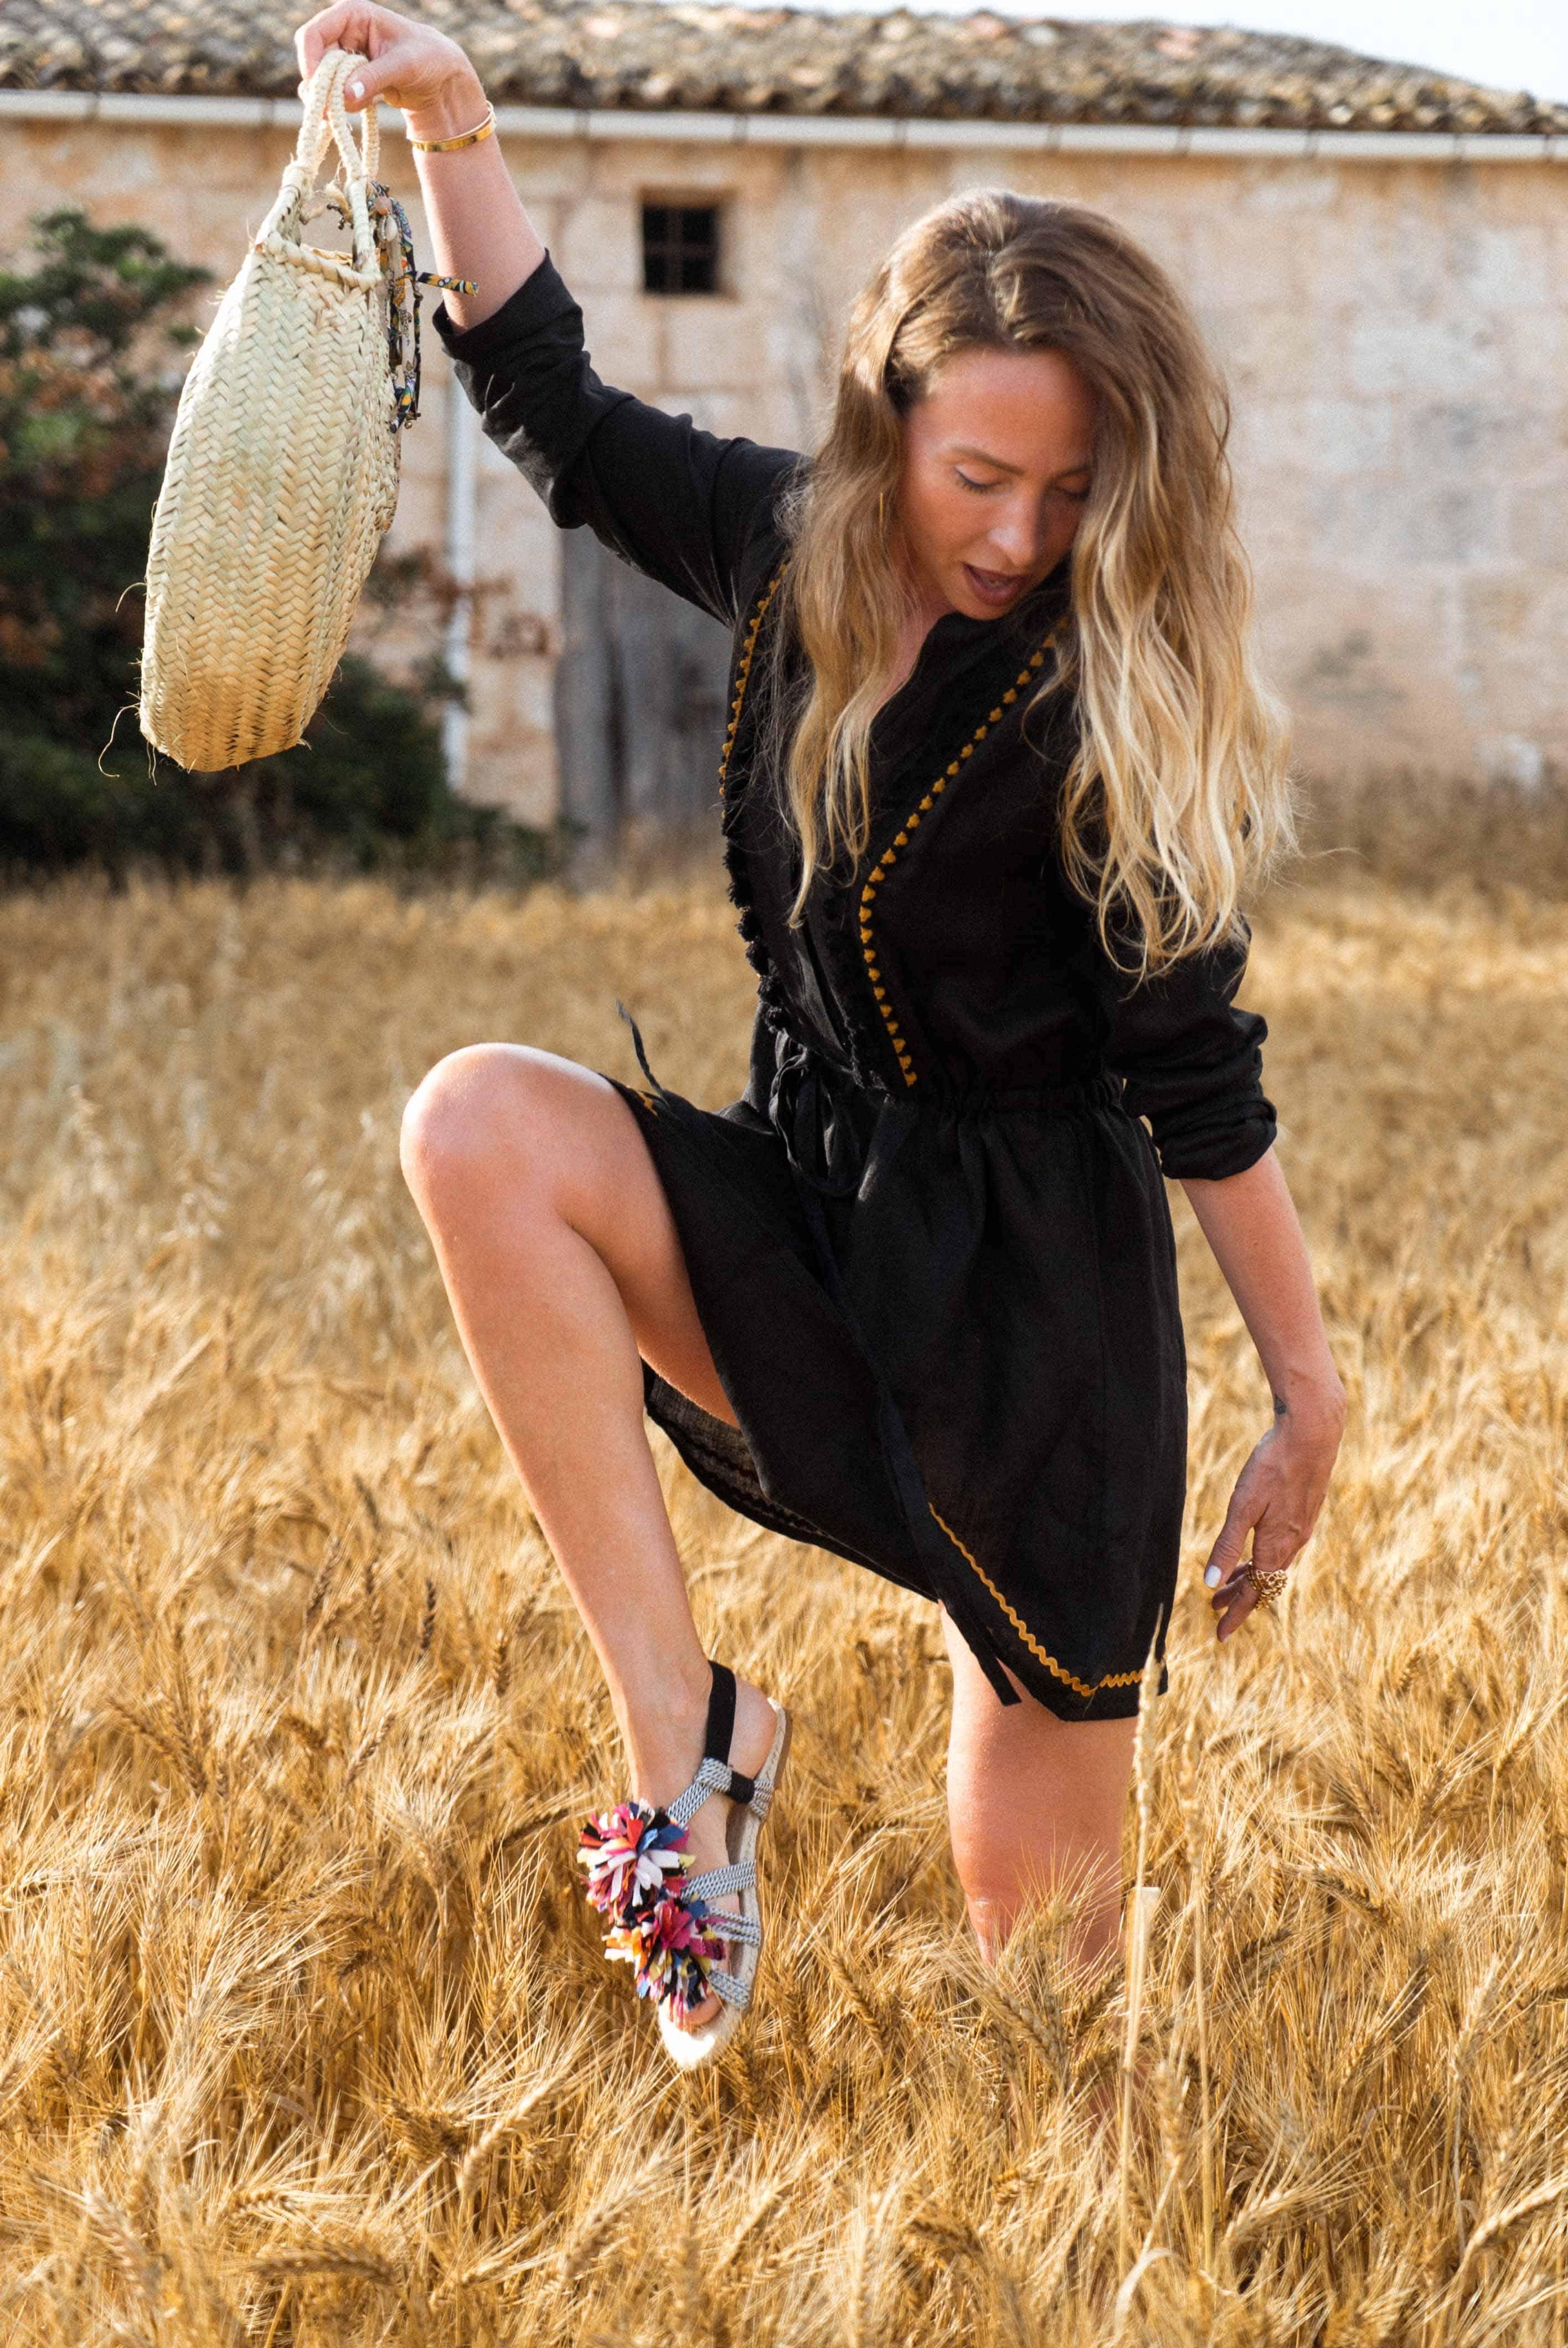 Leinentunika Nicki Nowicki Ü40 Blogger 40+